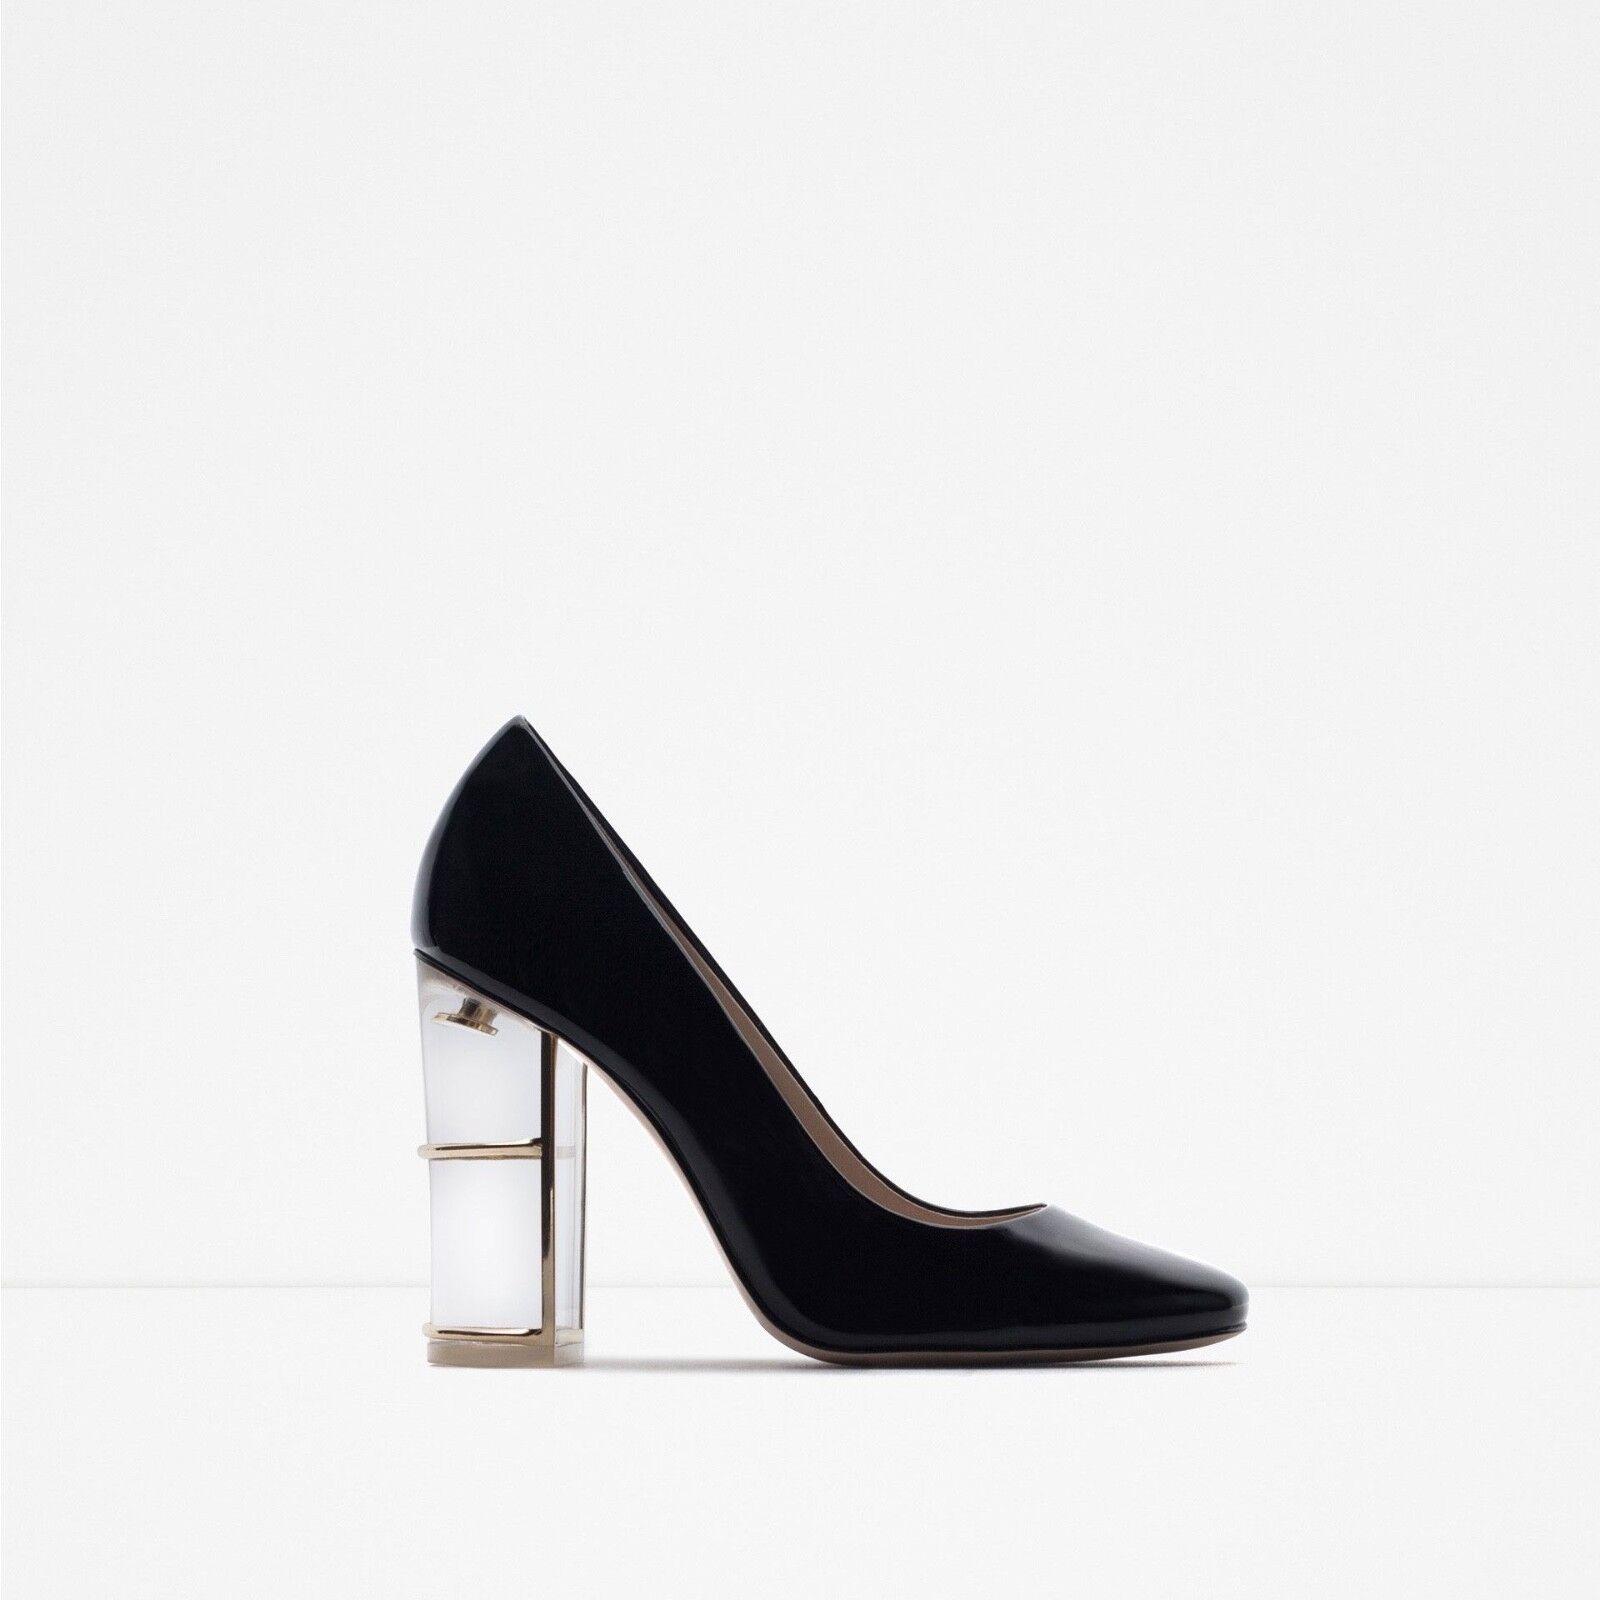 Zara schuhe with acrylic clear acrylic with heel detail in euro 36 6fa3fb